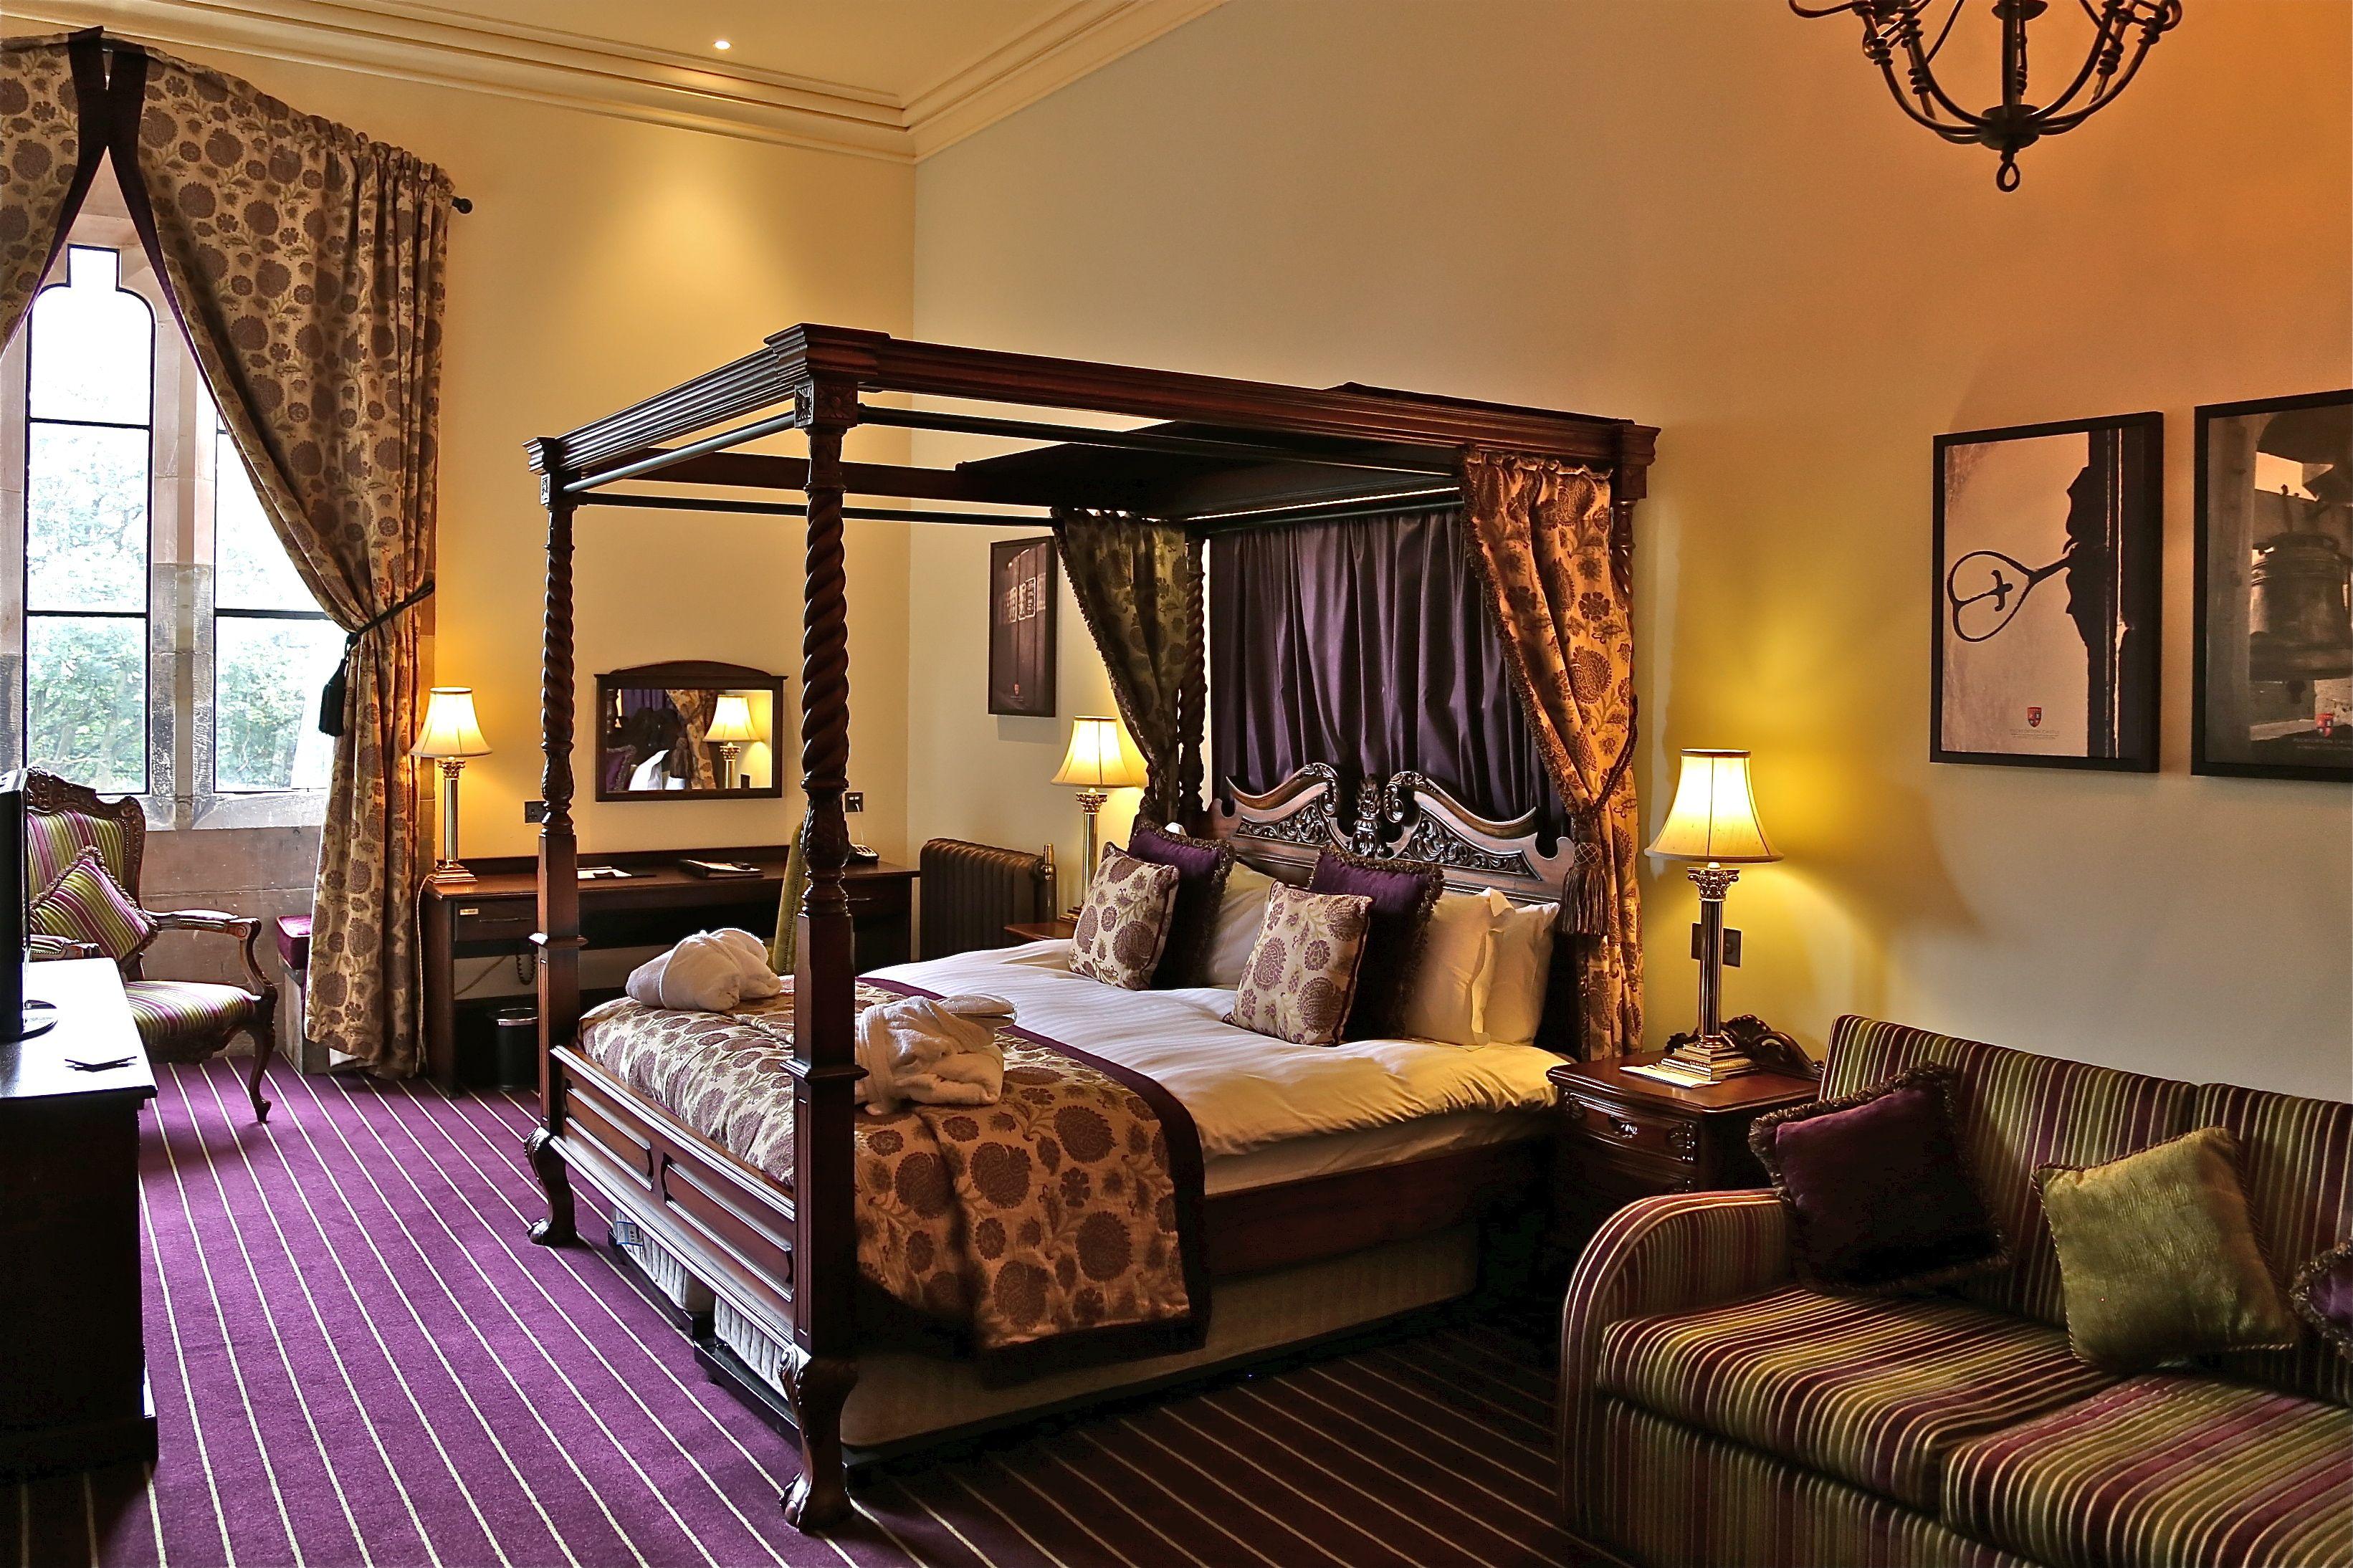 Peckforton castle hotel rooms 4 poster - Peckforton Castle Hotel Rooms 4 Poster Bed N Breakfast Hideaways Hotels And Resorts Pinterest Hj Rta Hotell Och Plansch